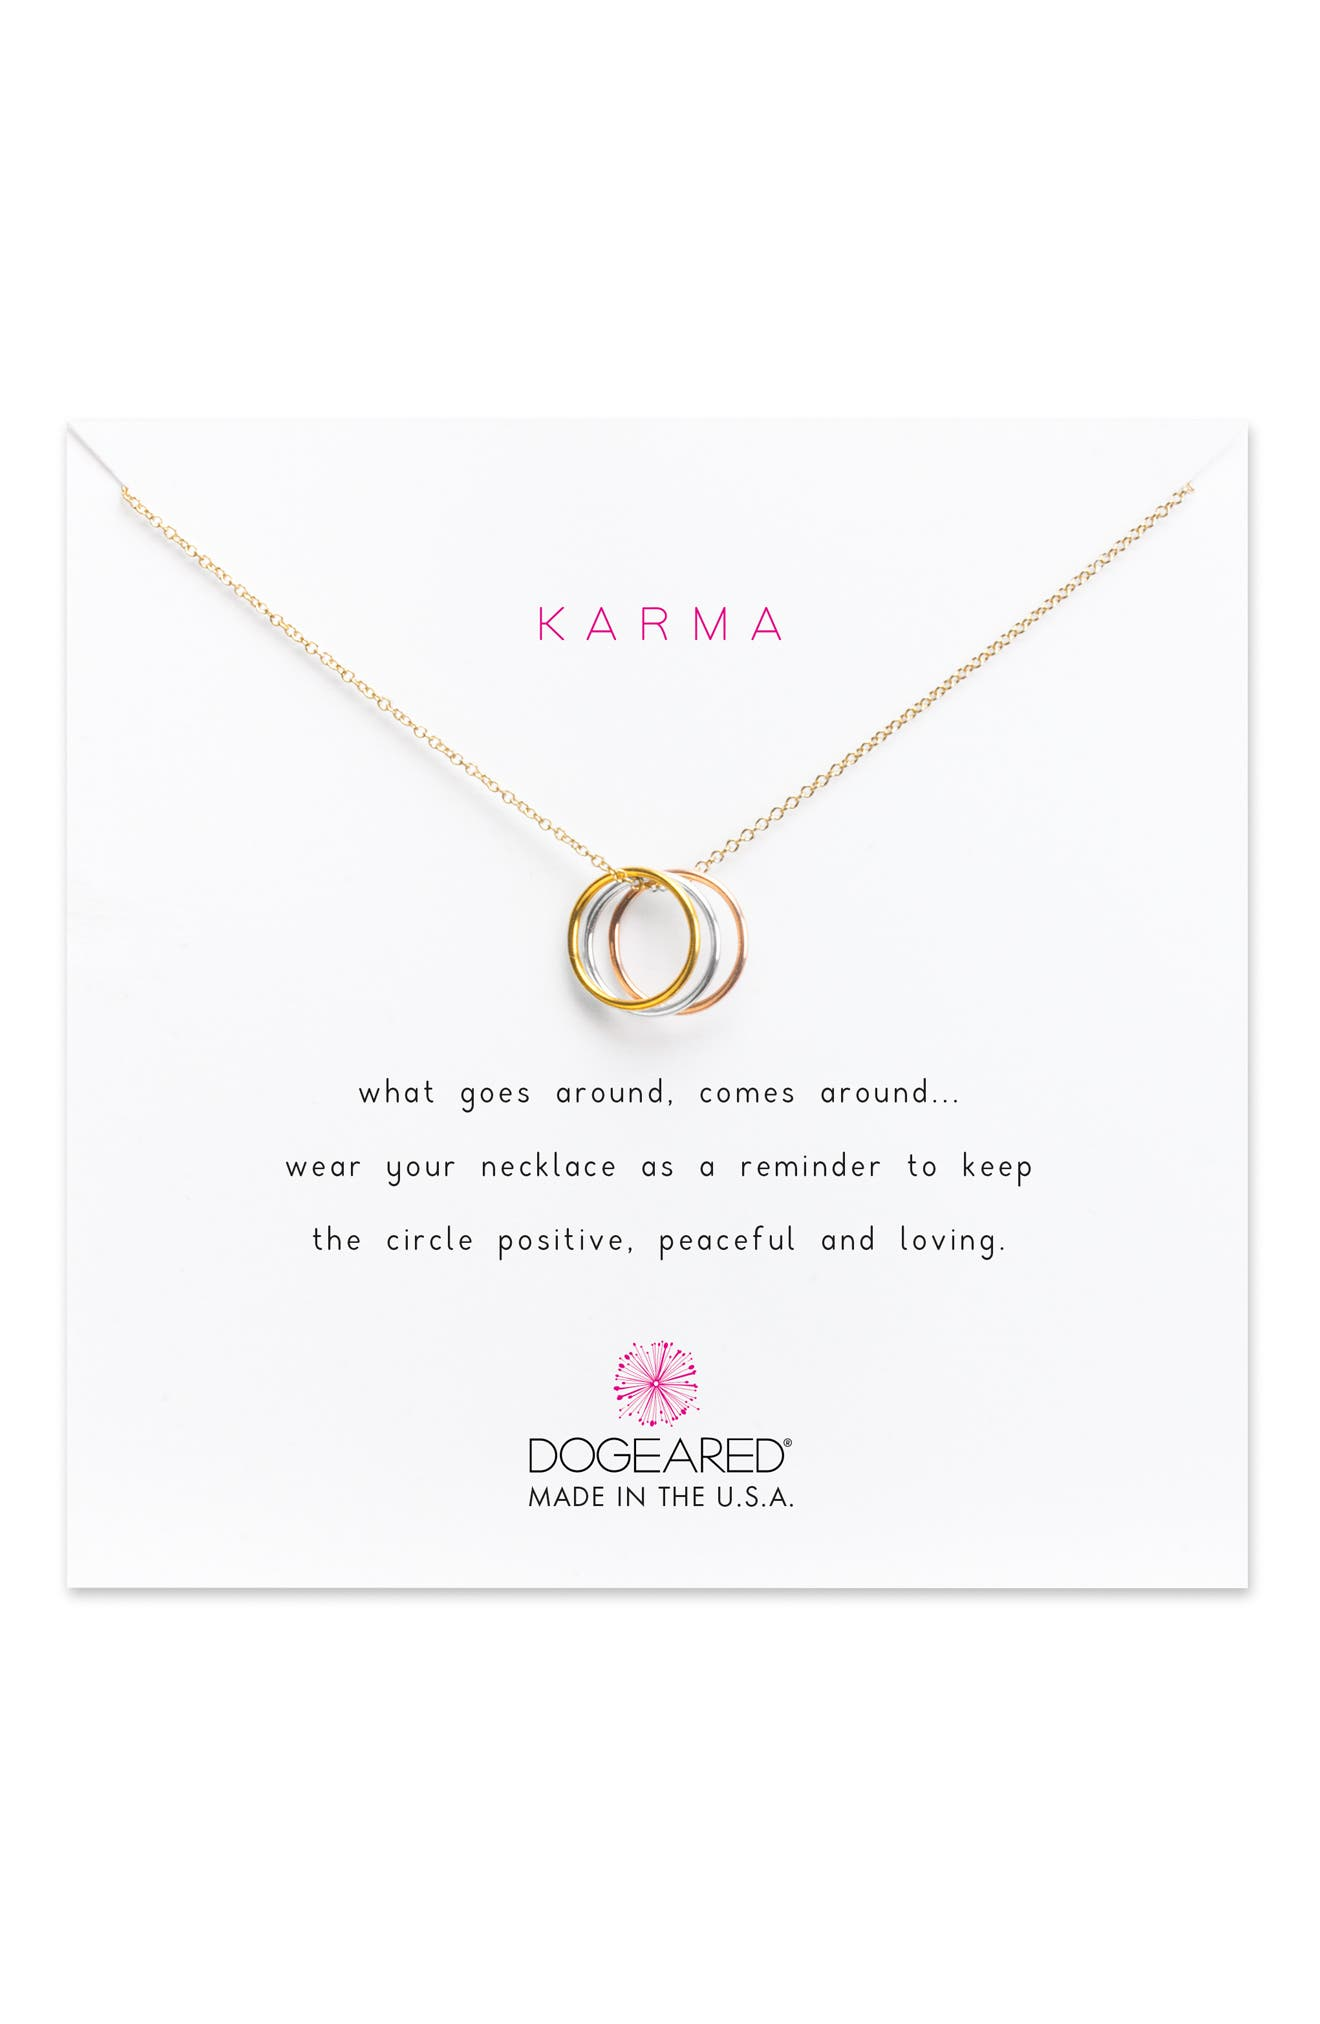 Triple Karma Pendant Necklace,                             Alternate thumbnail 4, color,                             711